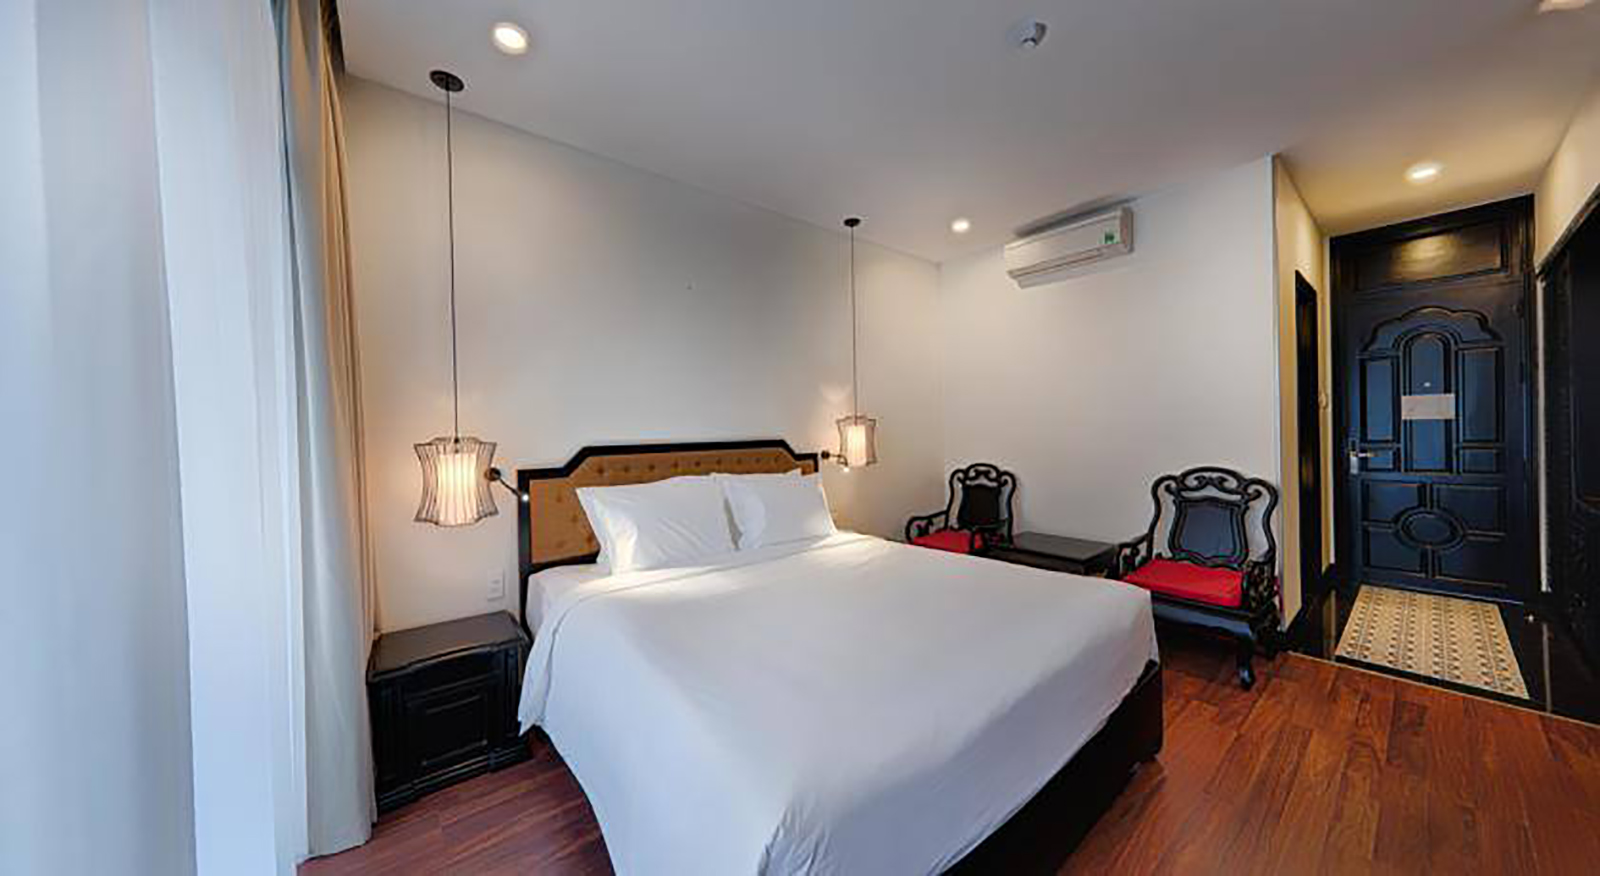 BELLE MAISON HADANA HOTEL & SPA